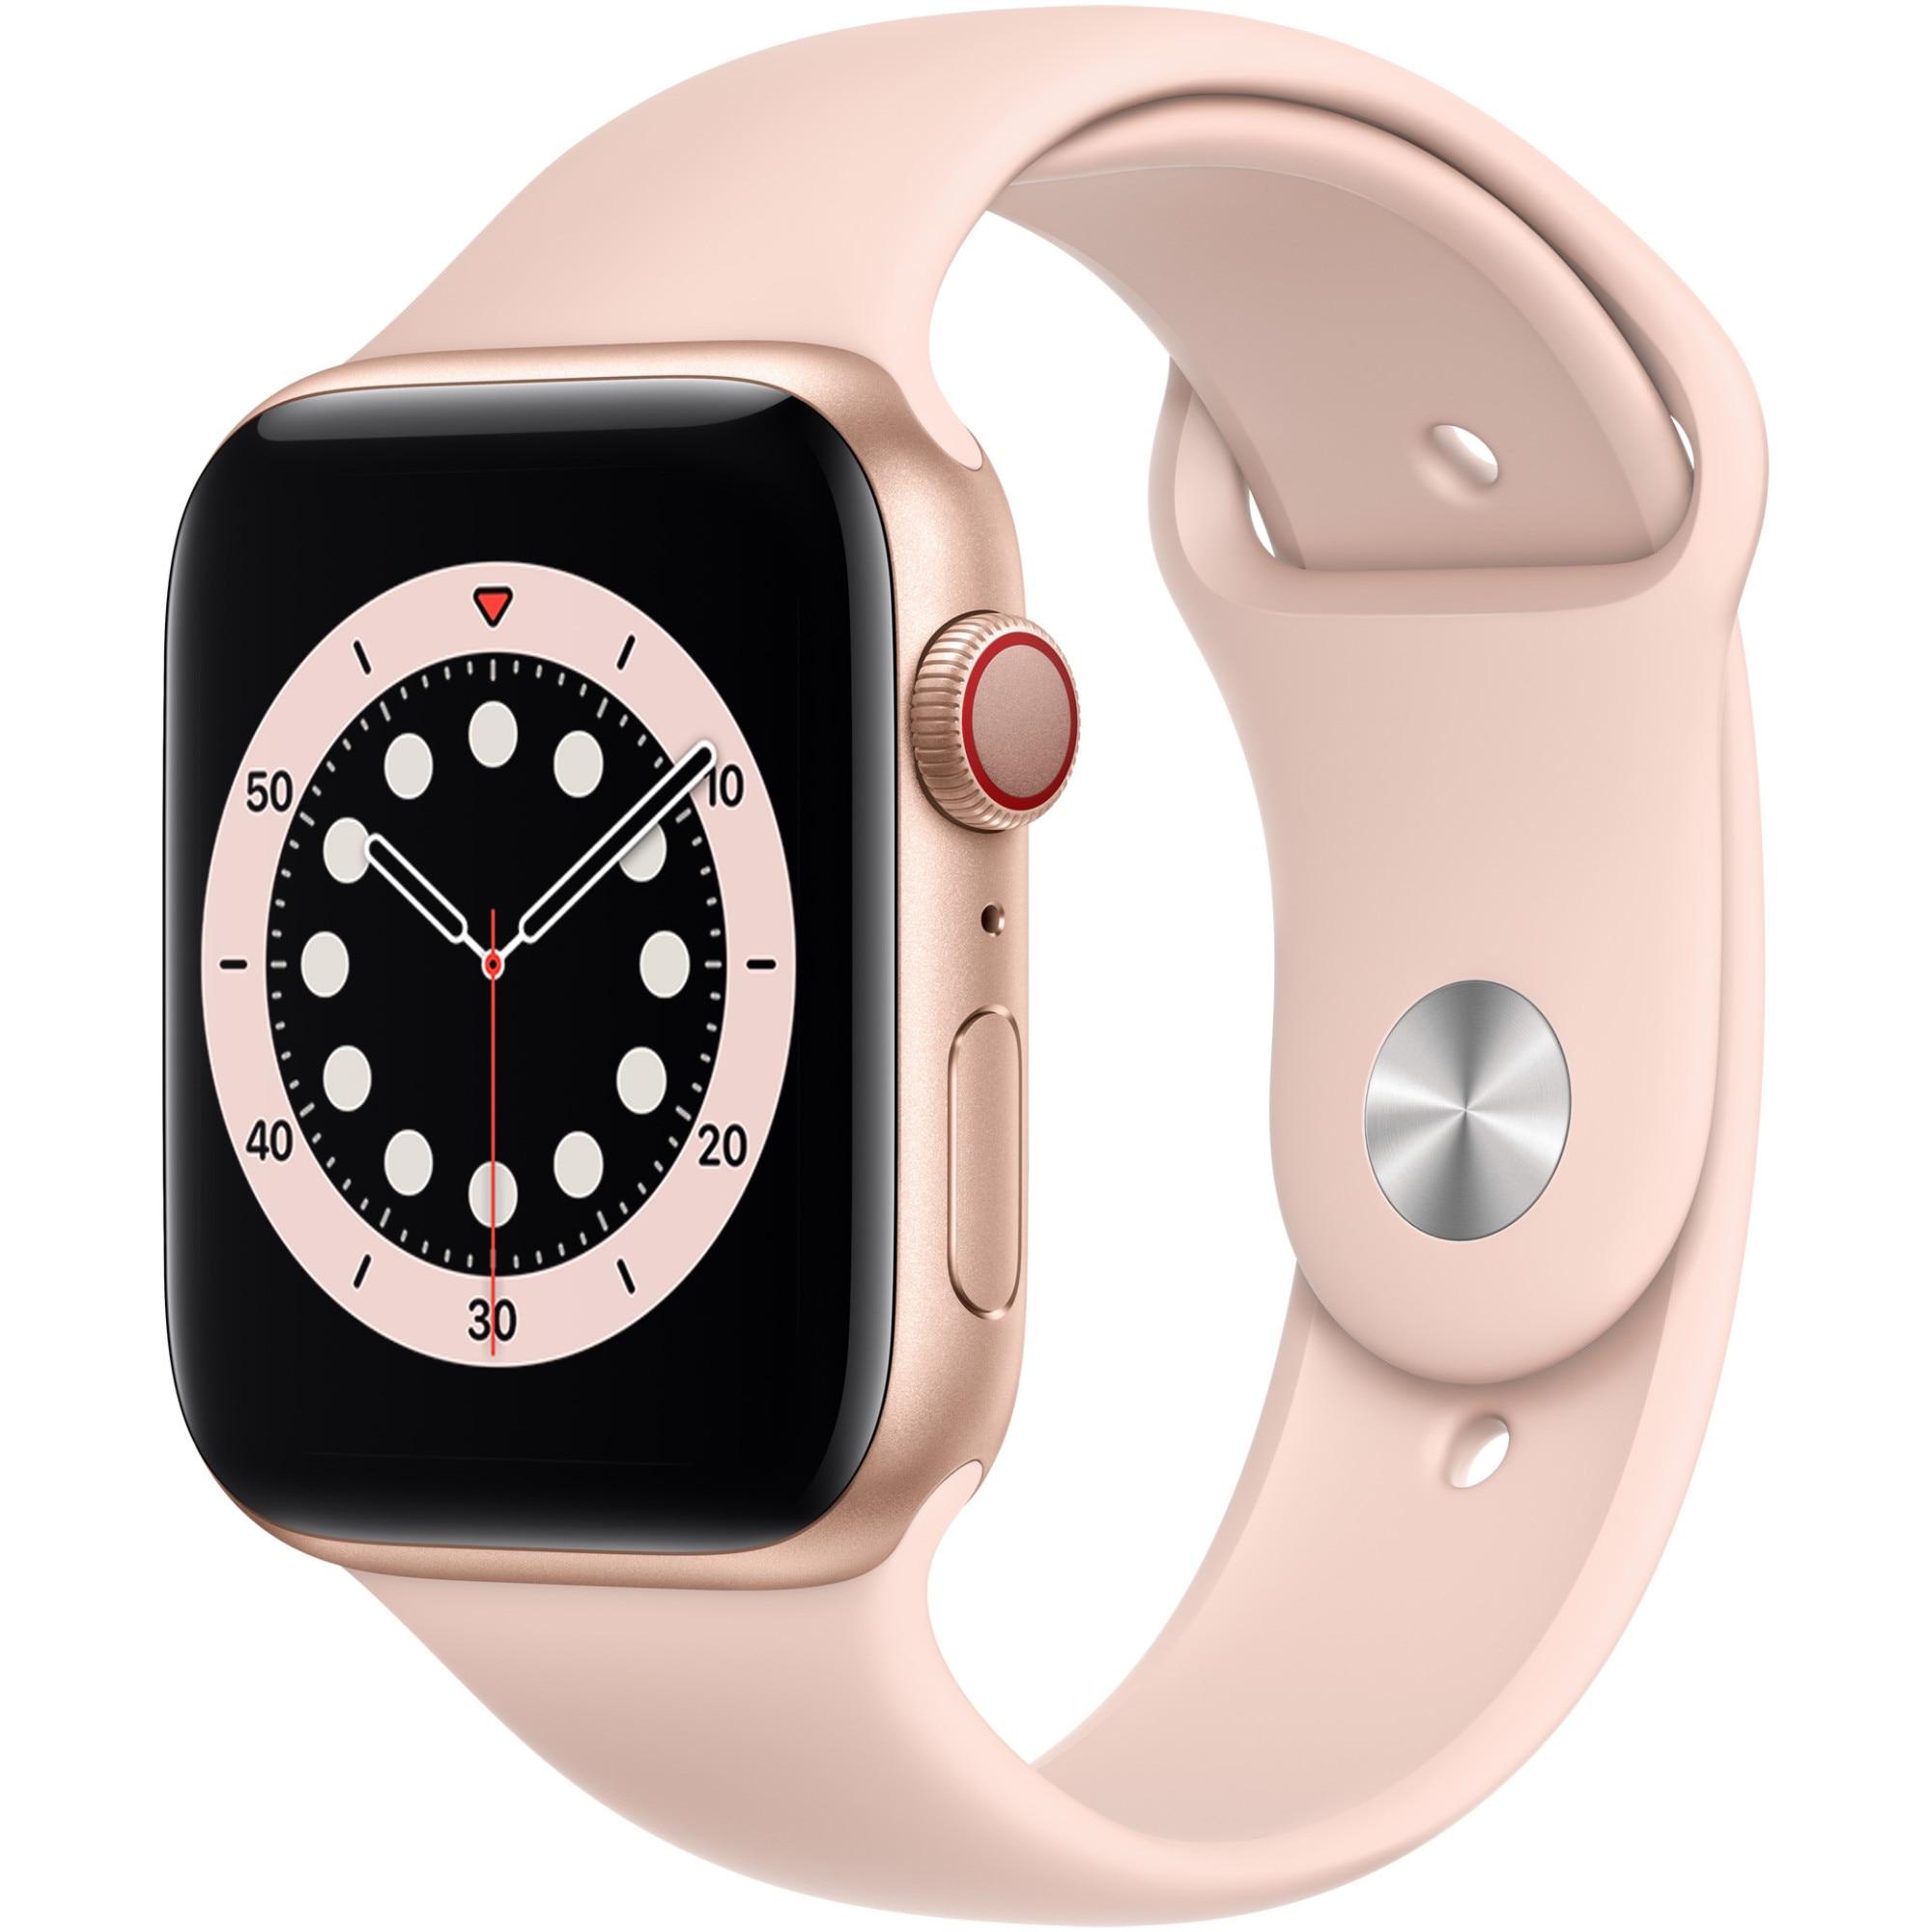 Fotografie Apple Watch 6, GPS, Cellular, Carcasa Gold Aluminium 44mm, Pink Sand Sport Band